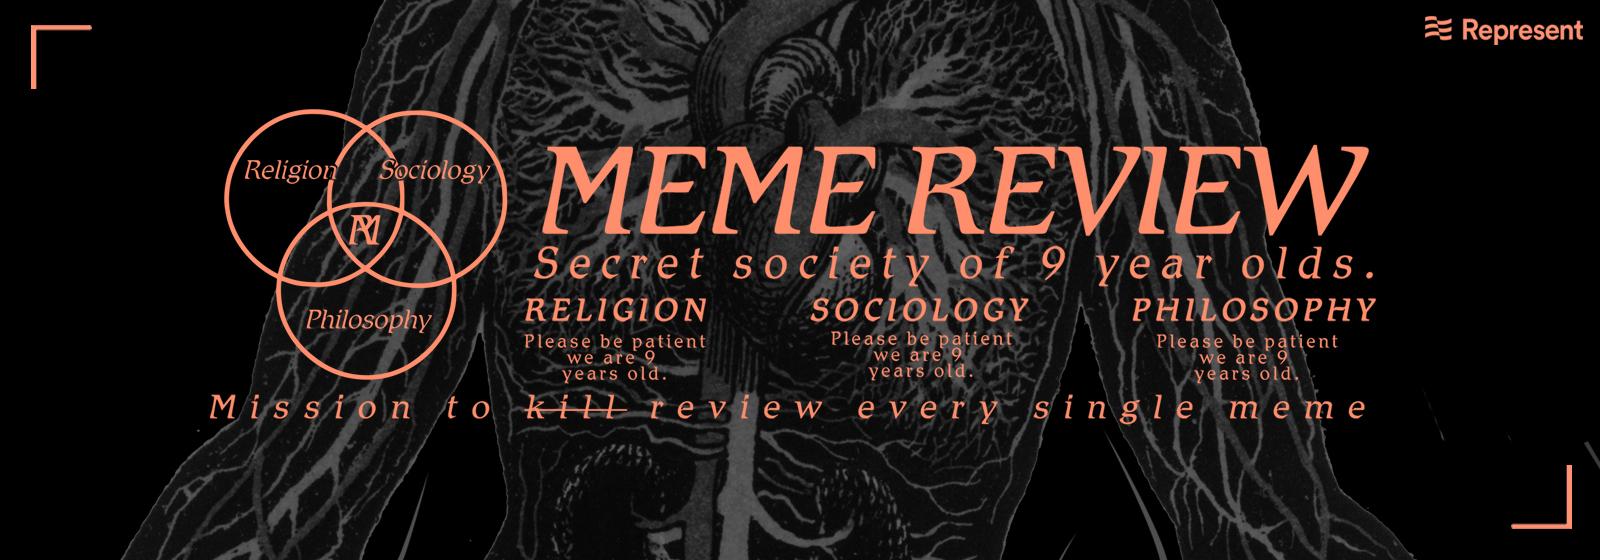 PewDiePie | Meme Review Store Store